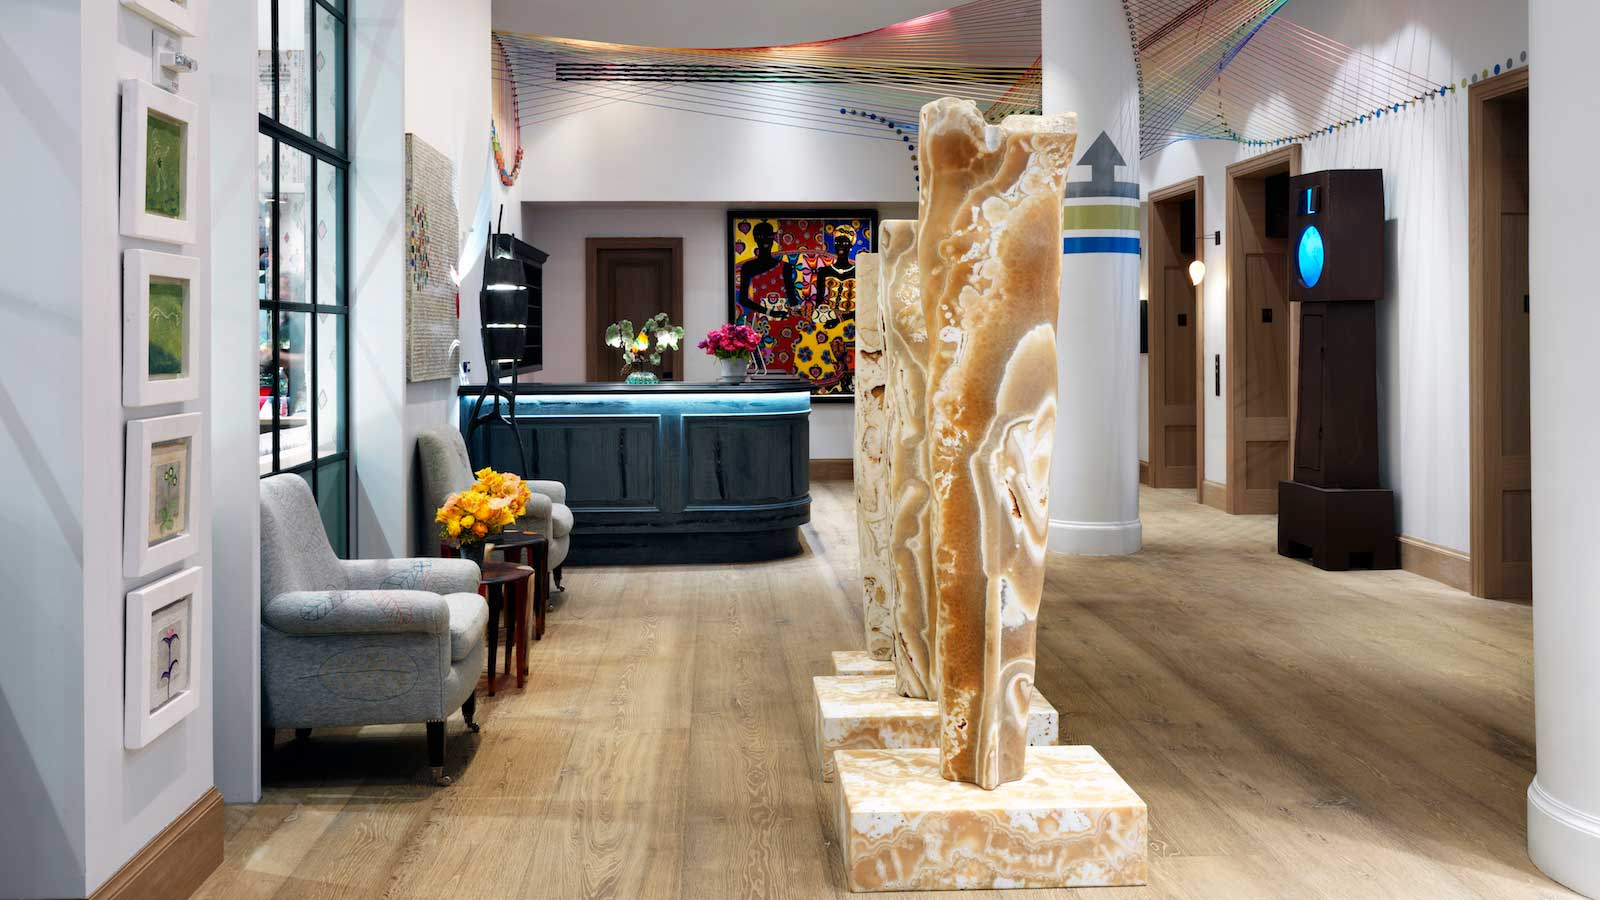 The whitby hotel new york trendland for Boutique hotel anahi roma